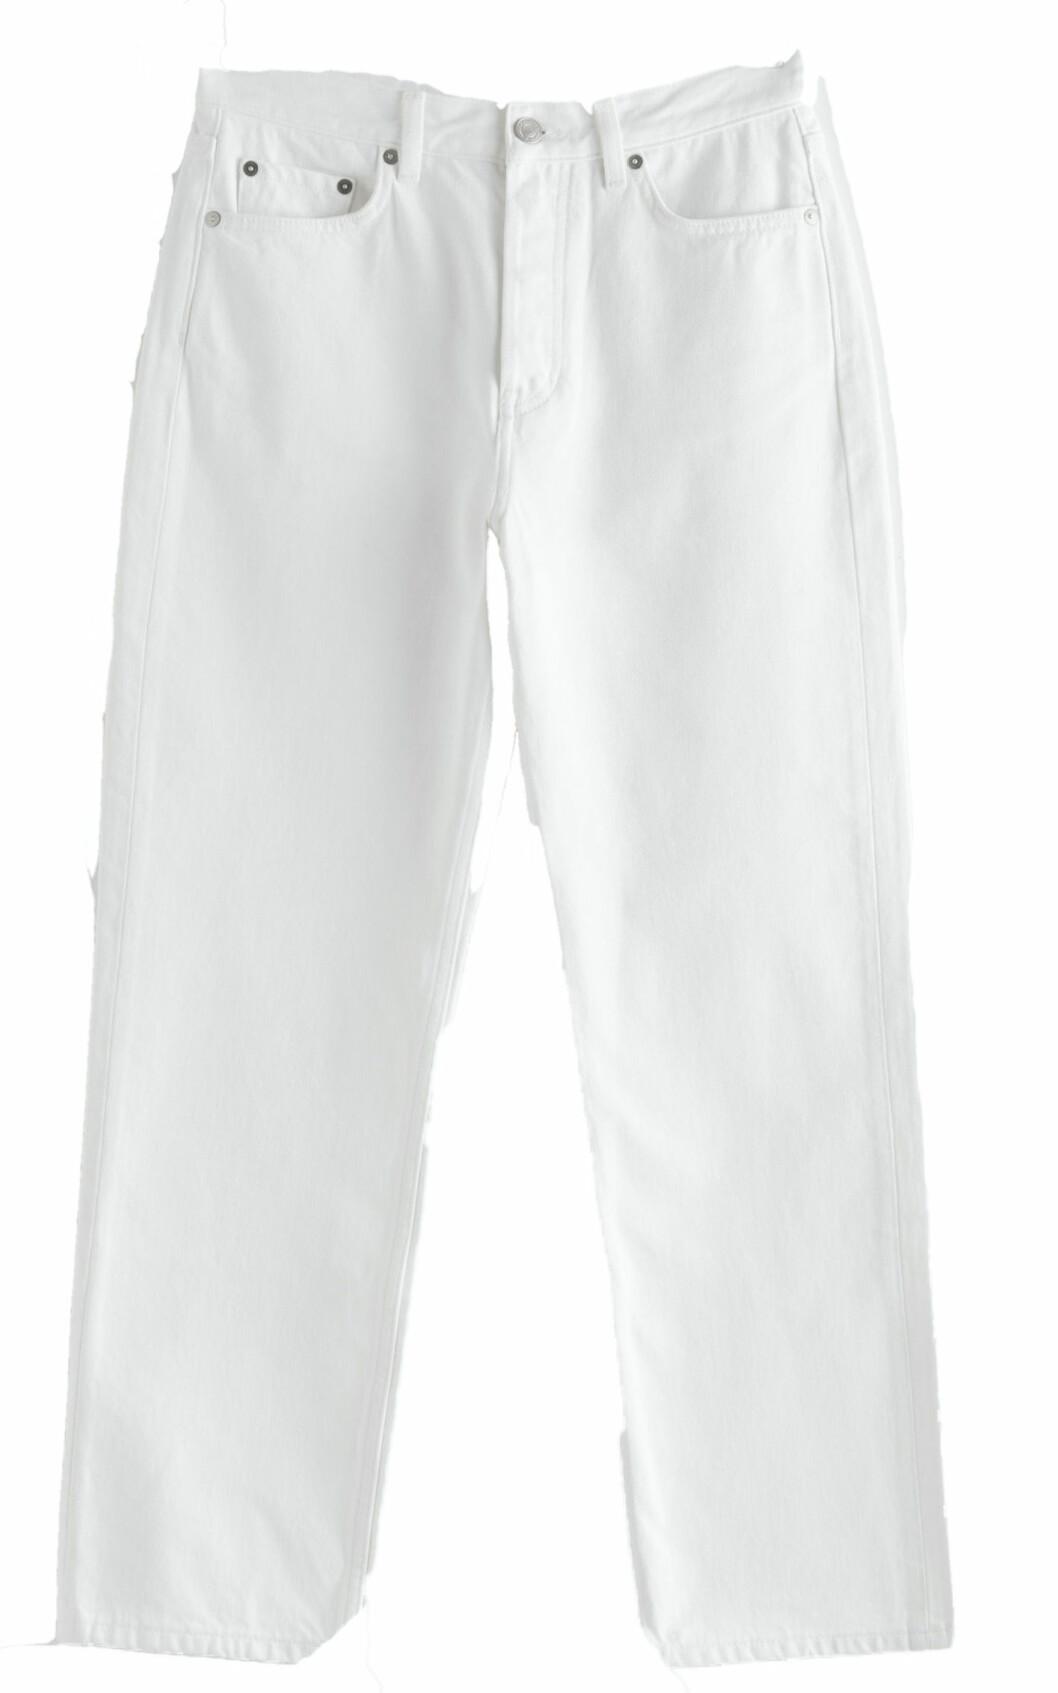 Vita jeans från & Other stories.